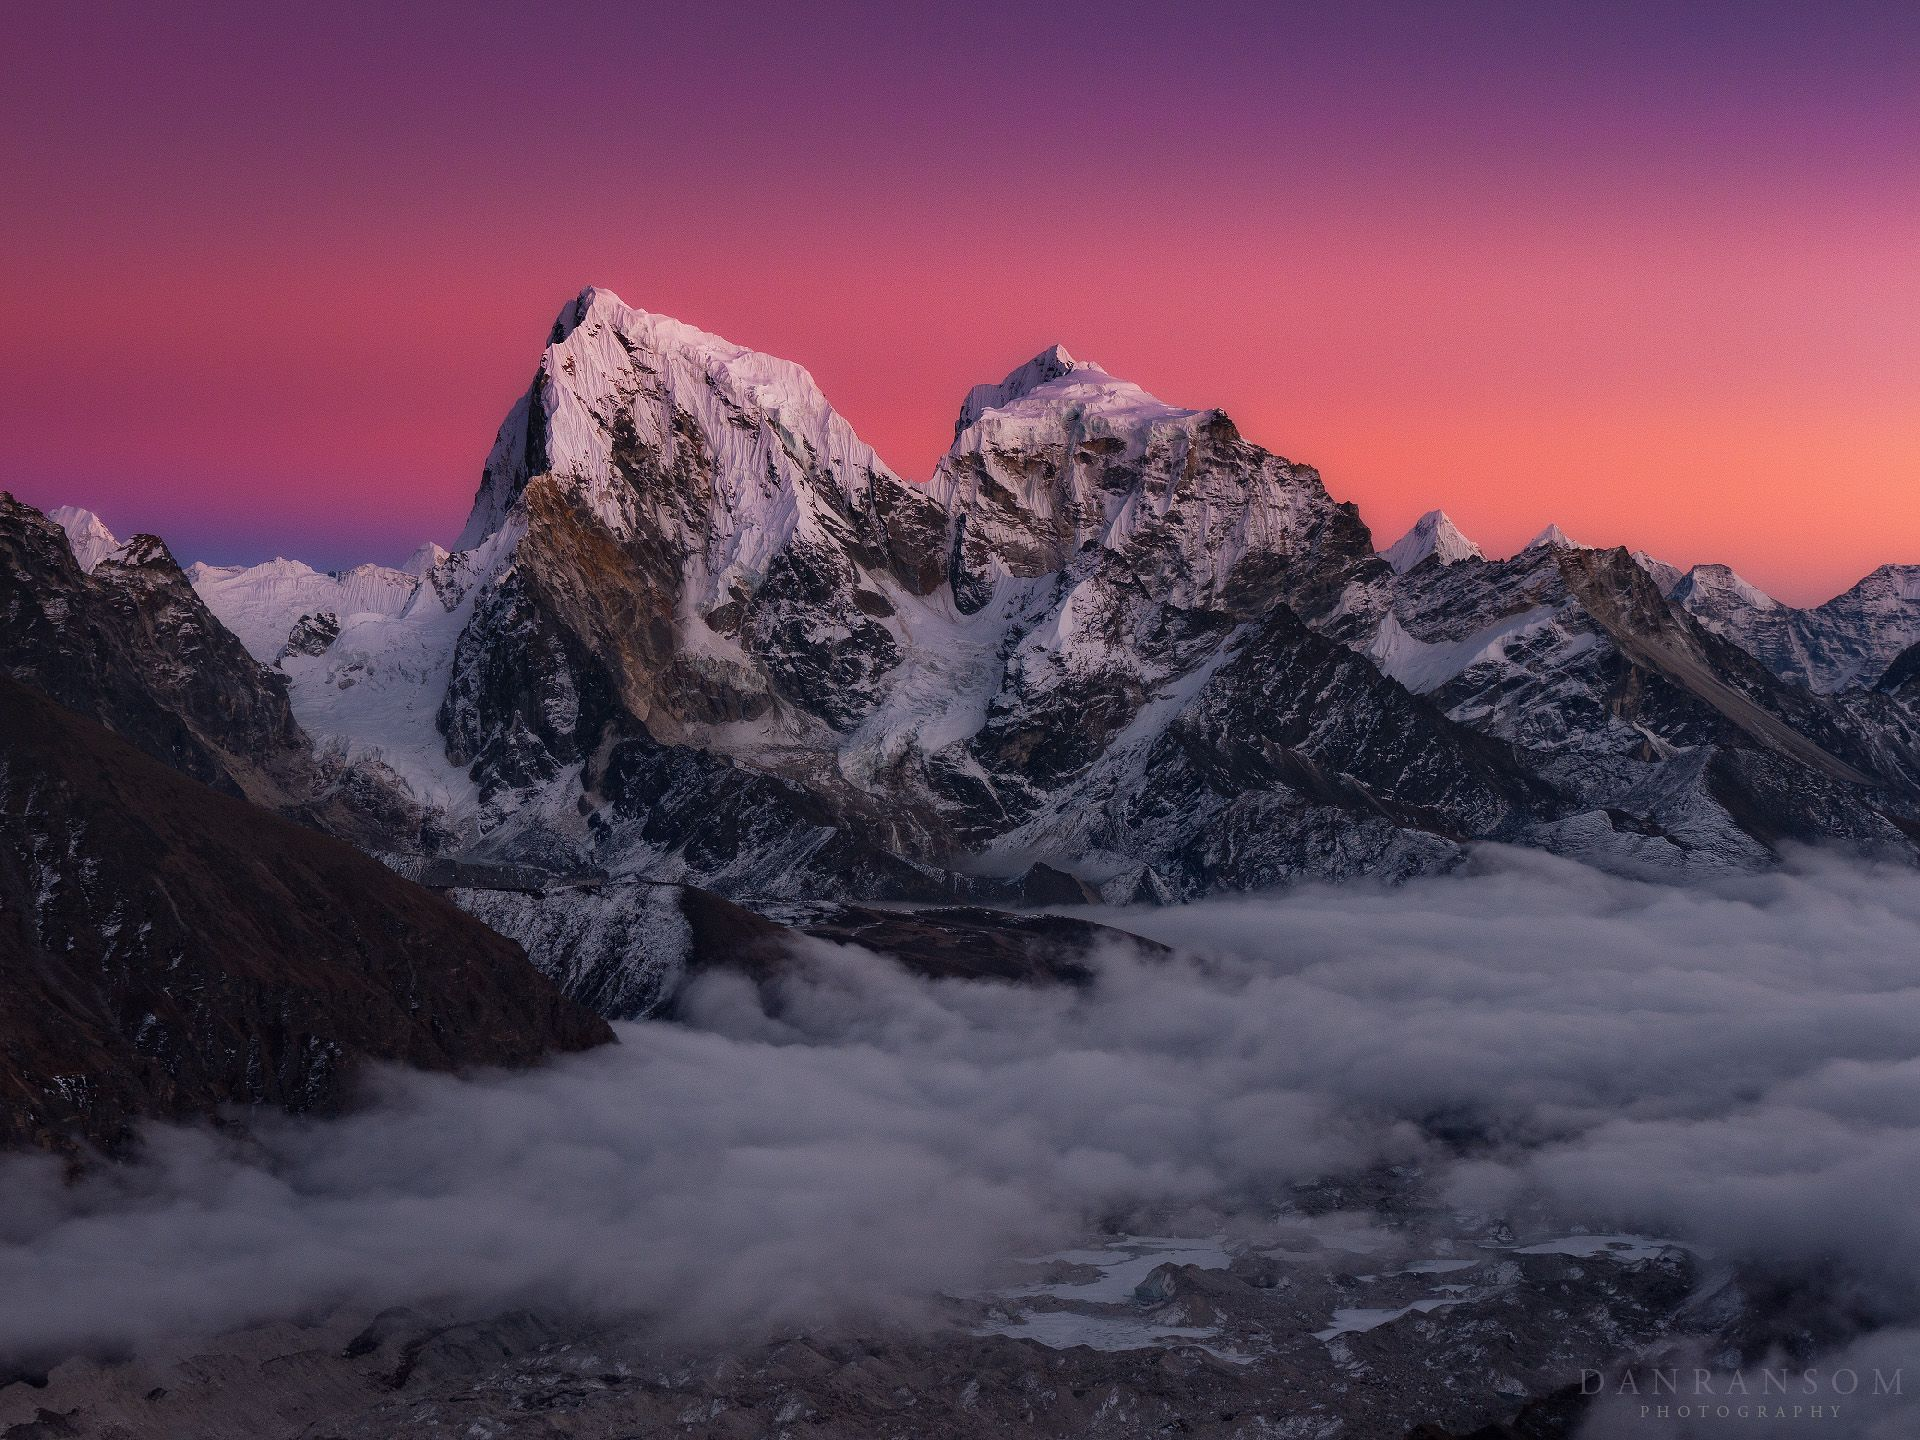 Himalayan Alpenglow Prettiest Peaks Iphone 6 wallpaper Retina 1920x1440